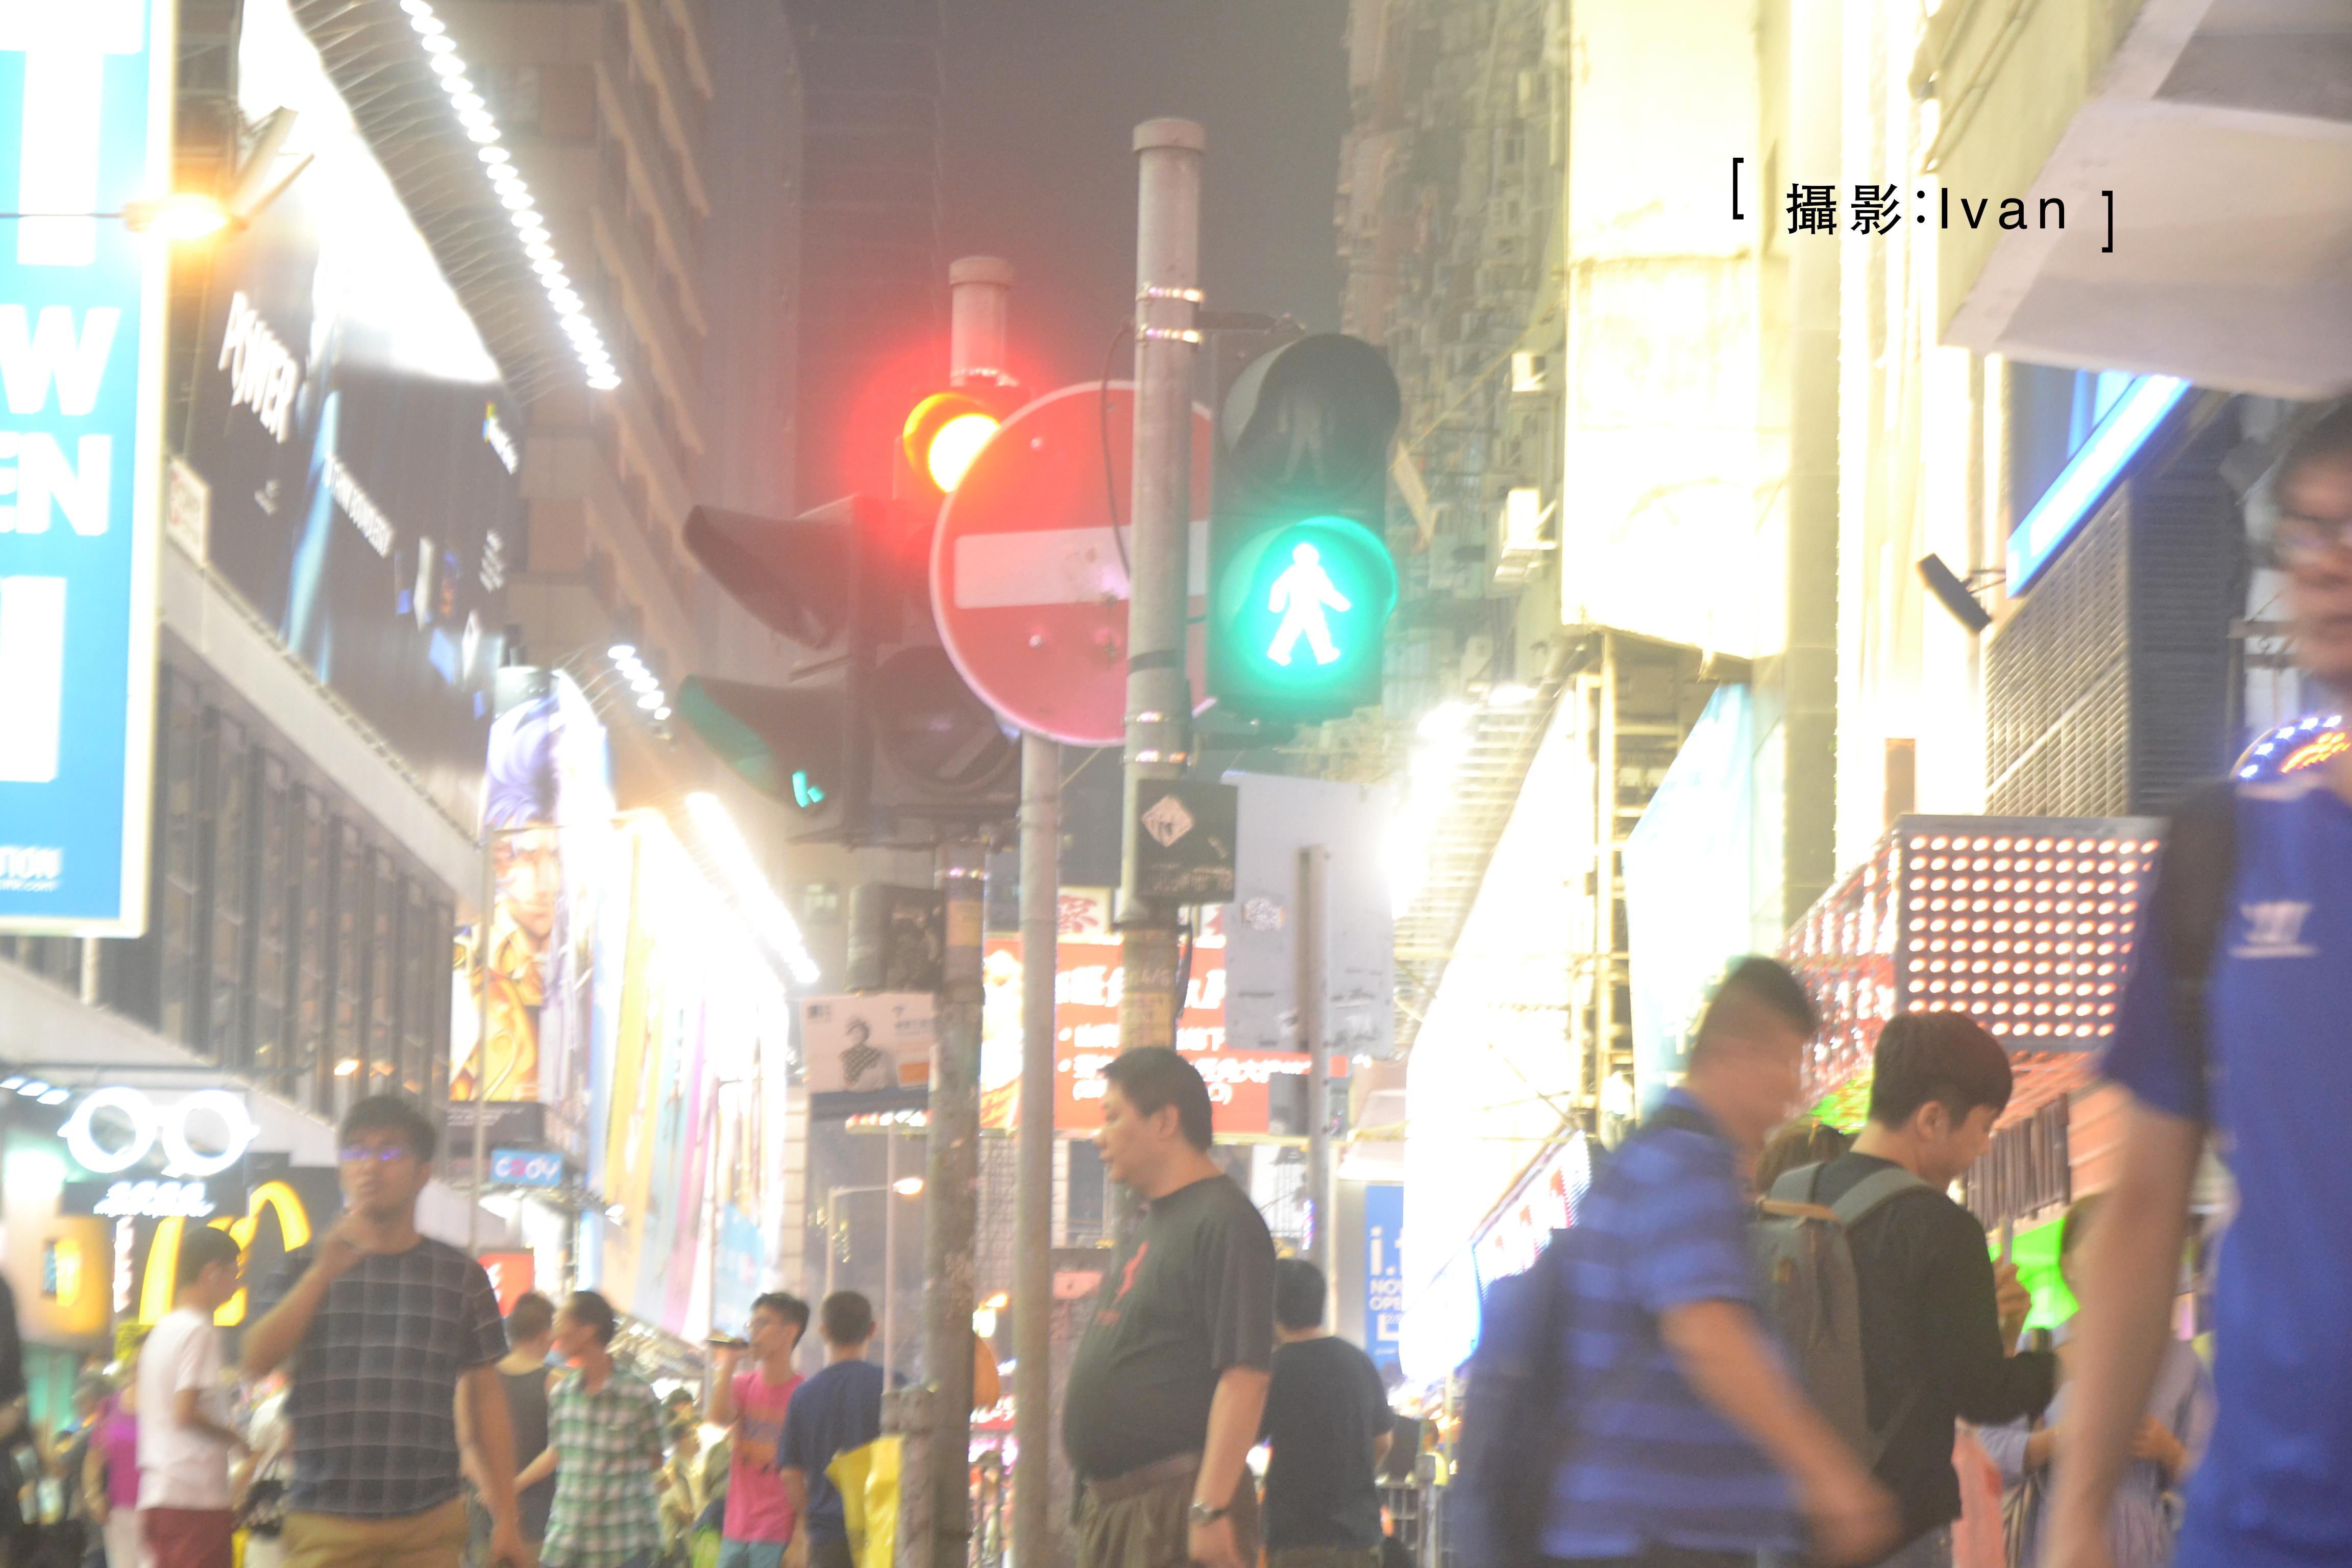 http://ubeat.com.cuhk.edu.hk/wp-content/uploads/2018/141_photos_17.jpg